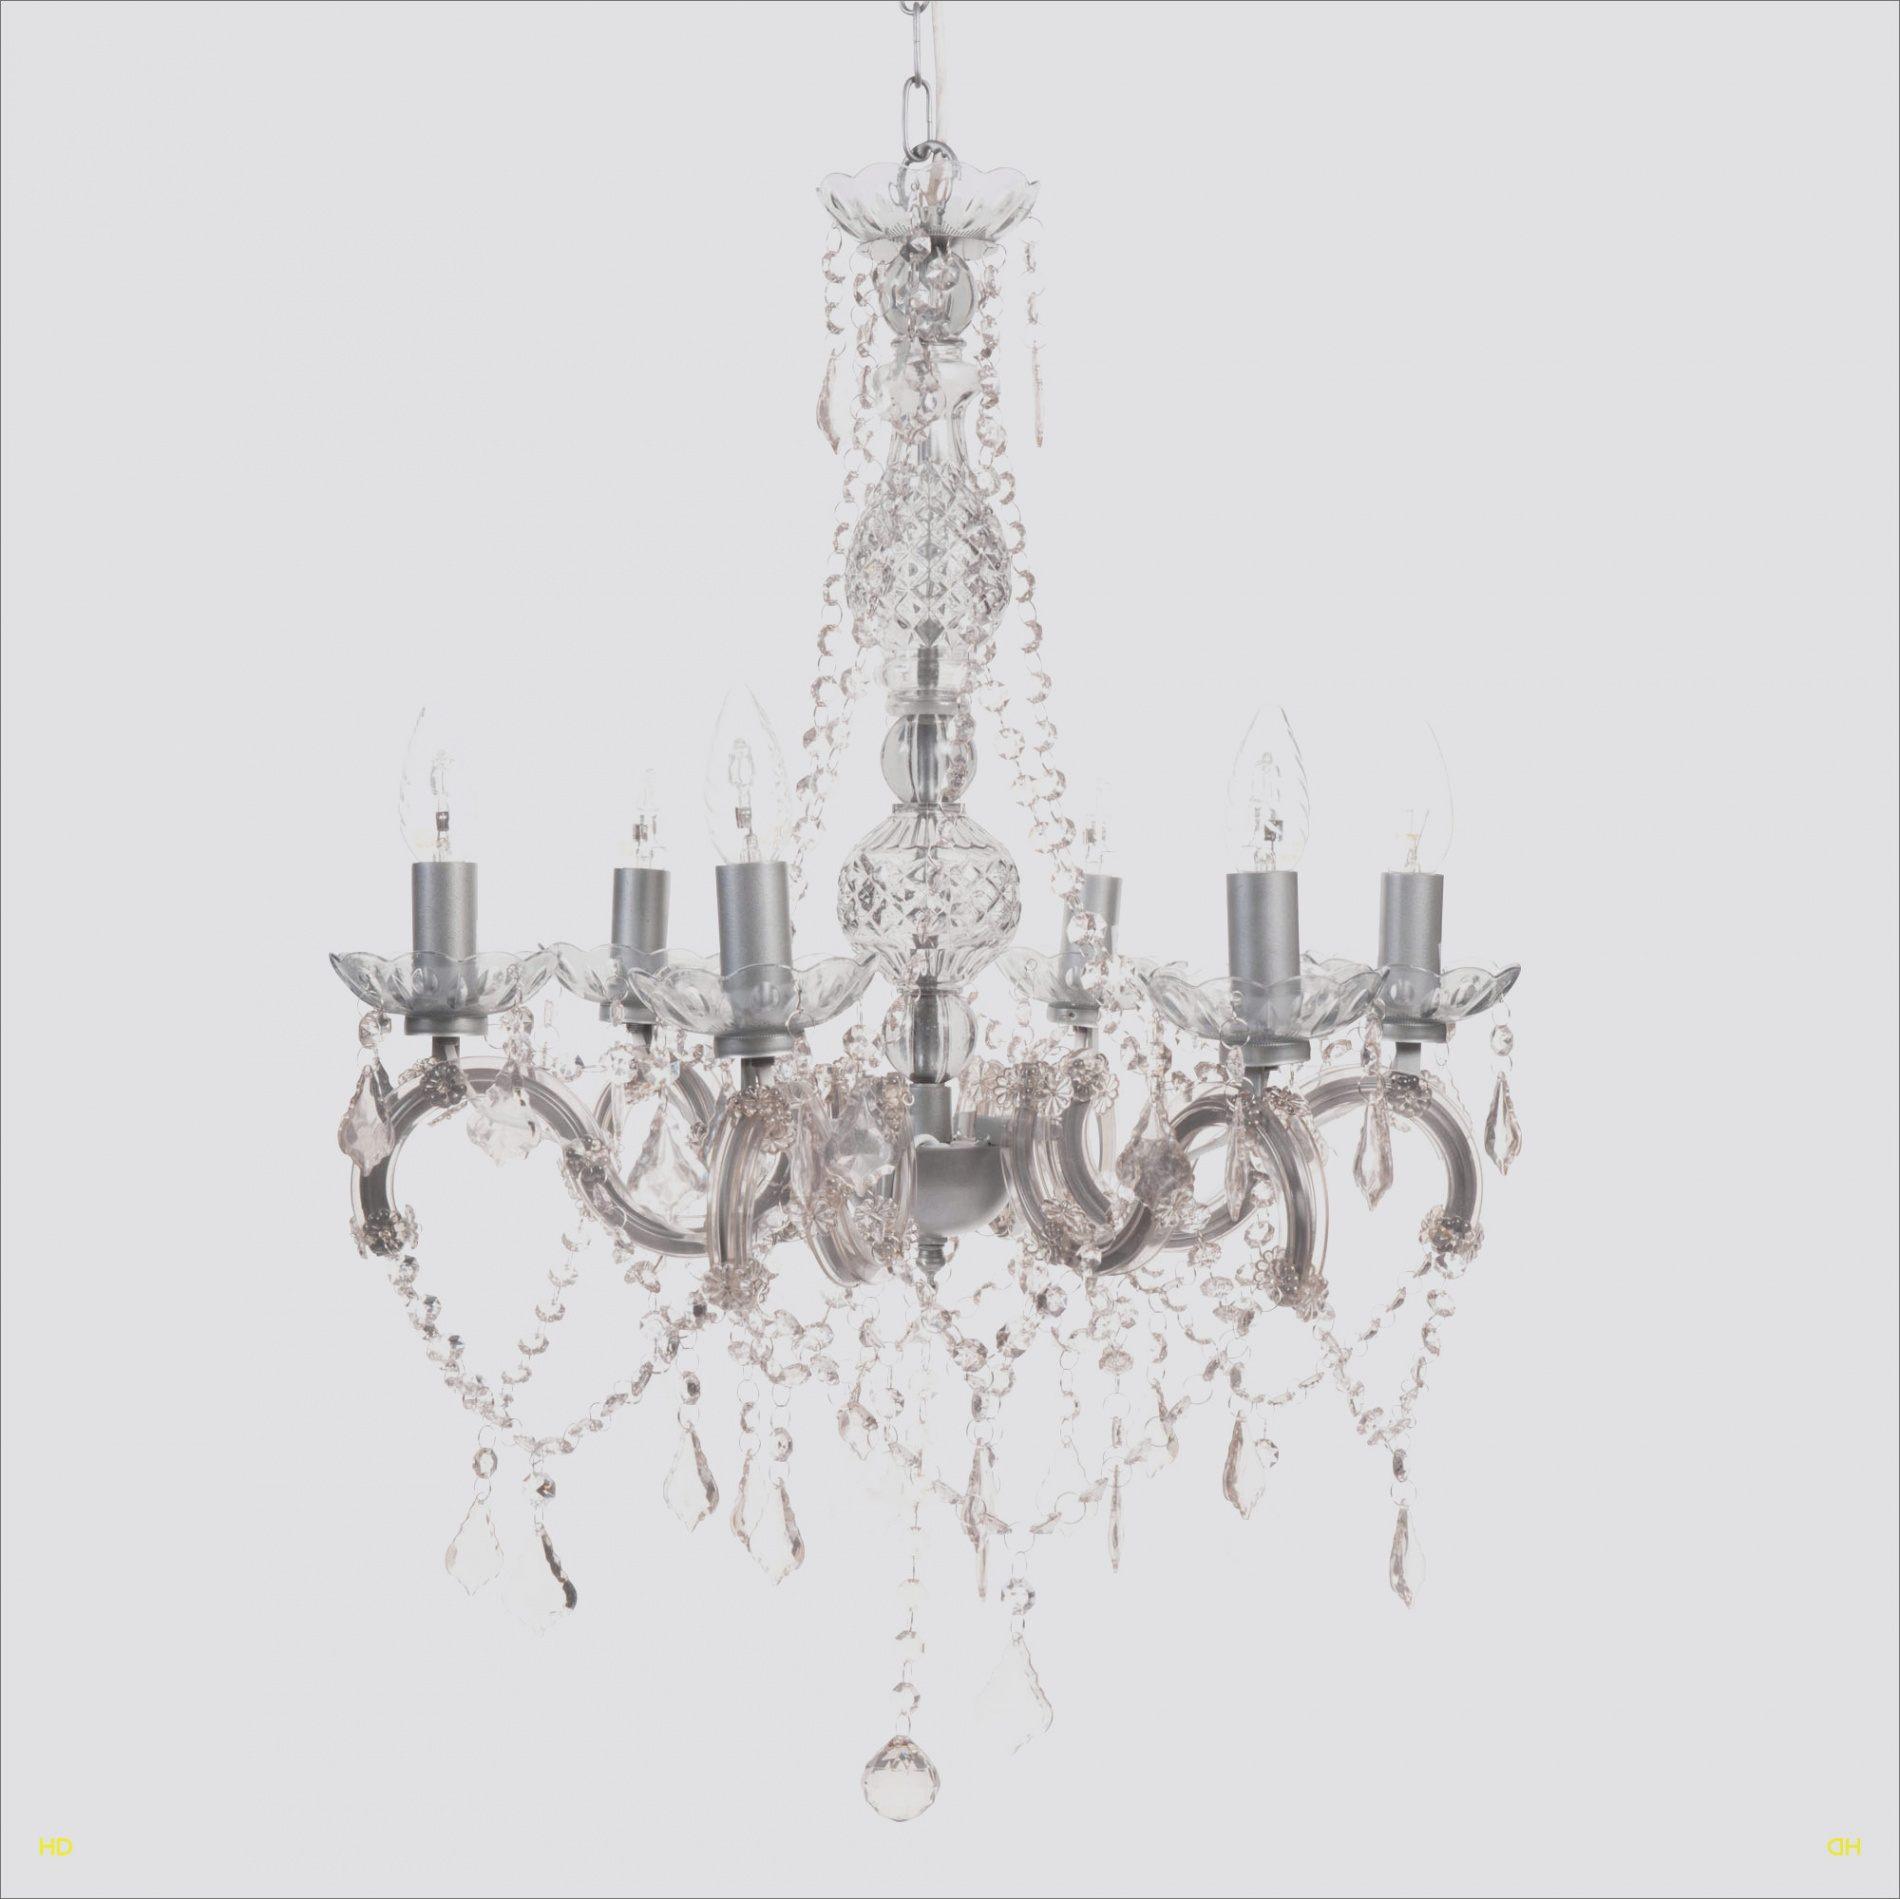 Tete De Lit Baroque De Luxe Lustre Style Baroque — Laguerredesmots